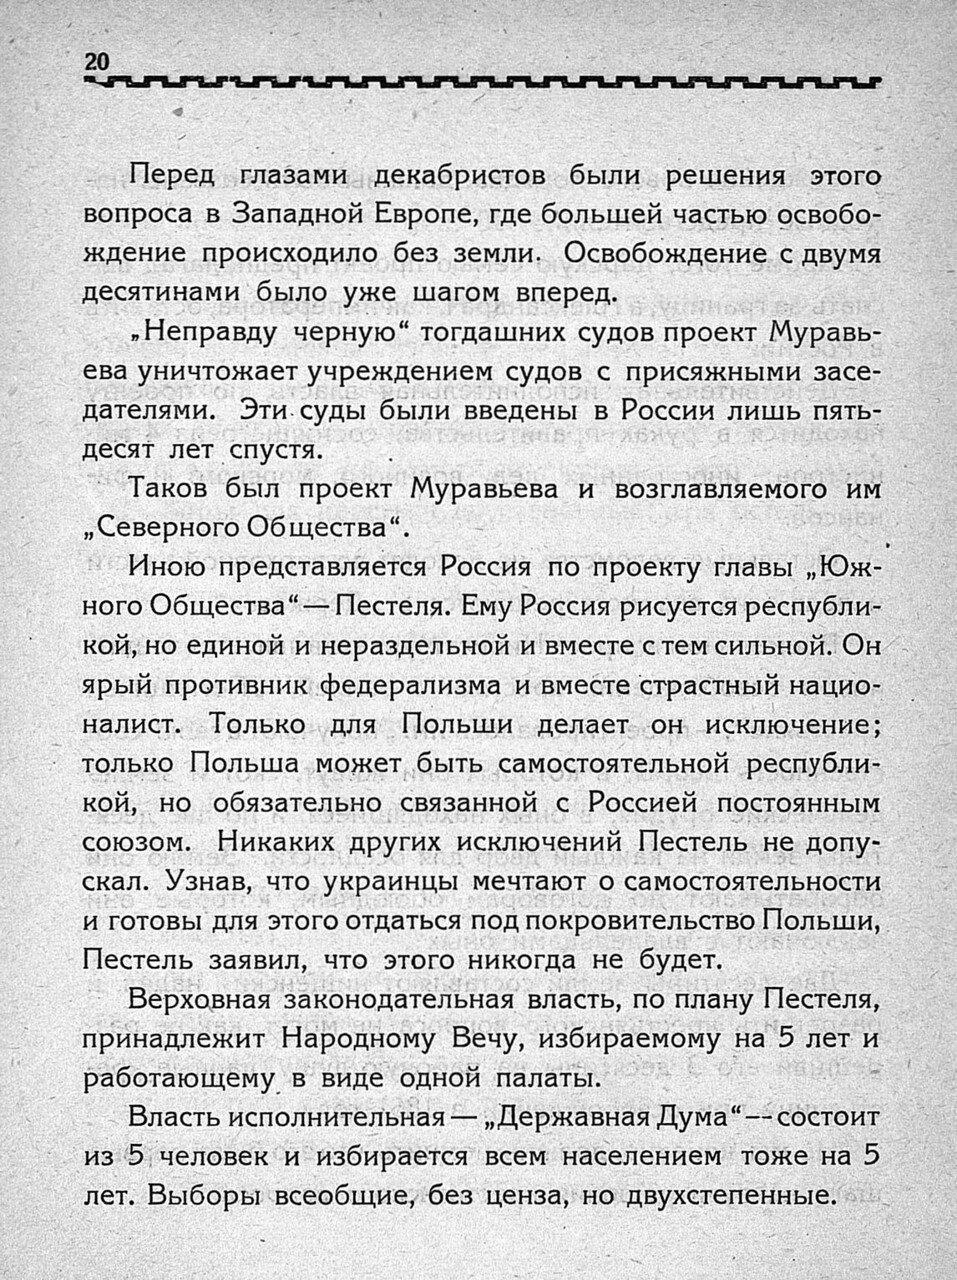 https://img-fotki.yandex.ru/get/40987/199368979.23/0_1bfad8_c6bf7f2a_XXXL.jpg